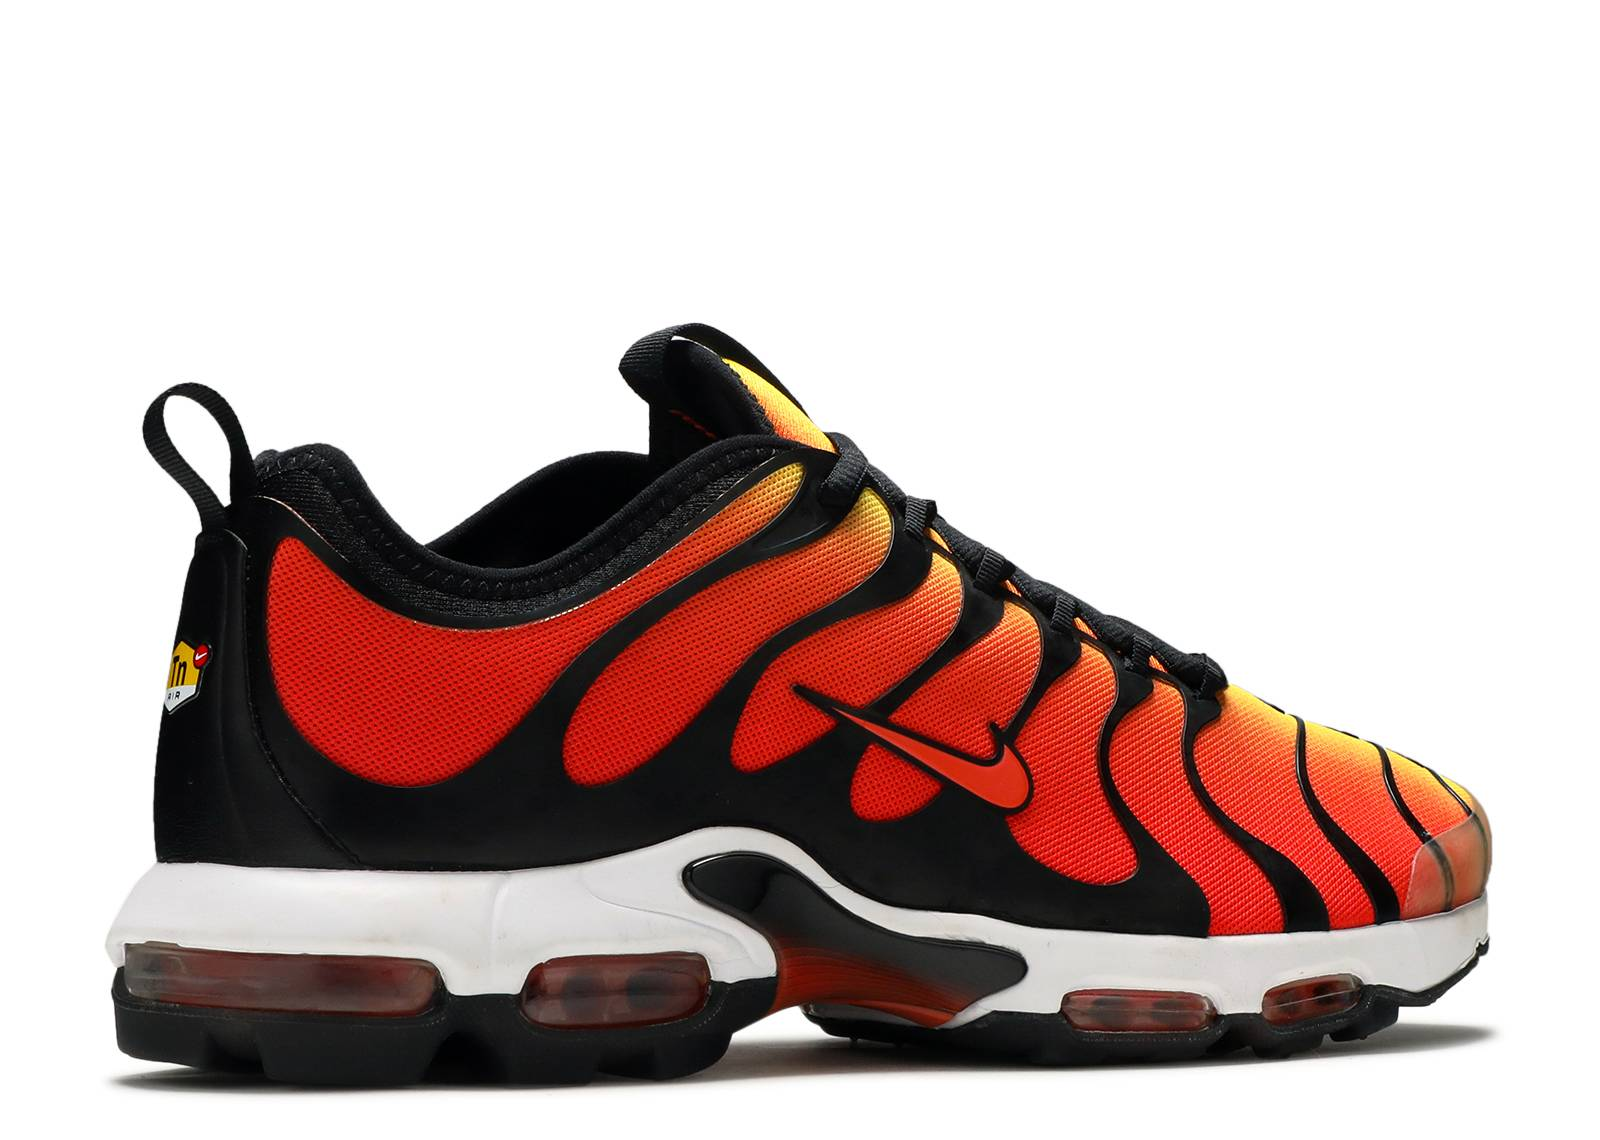 Air Max Plus TN Ultra 'Tiger' - Nike - 898015 004 - black/tour ...